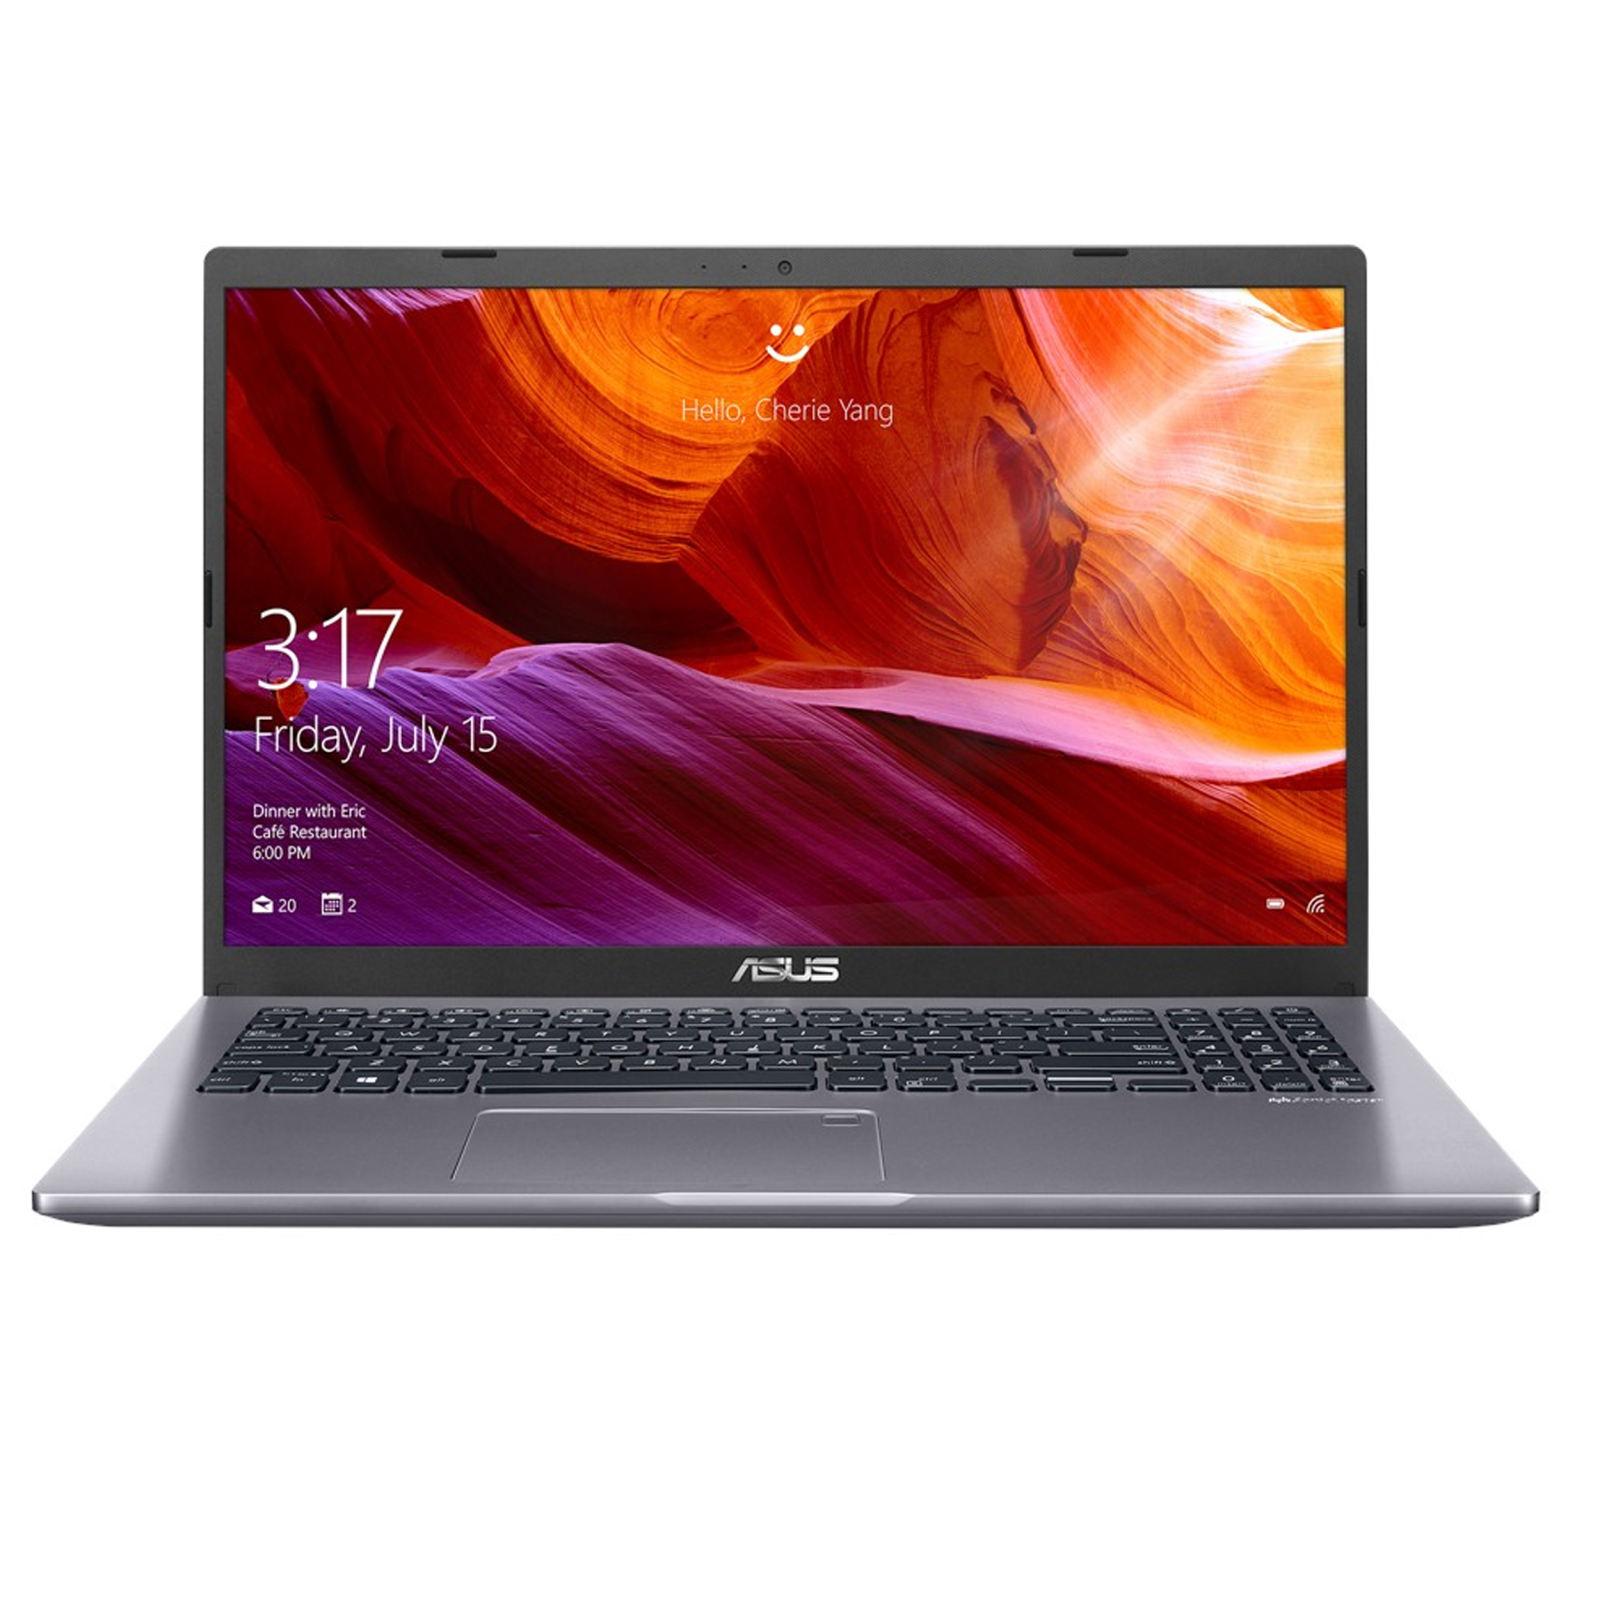 لپ تاپ 15 اینچی ایسوس مدل VivoBook R521JP - B